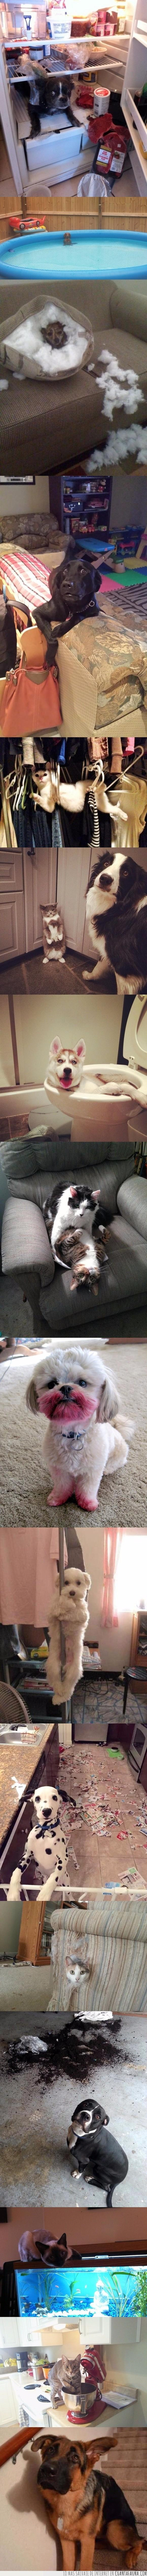 amos,animales,dueños,gatos,mascotas,perros,pillada